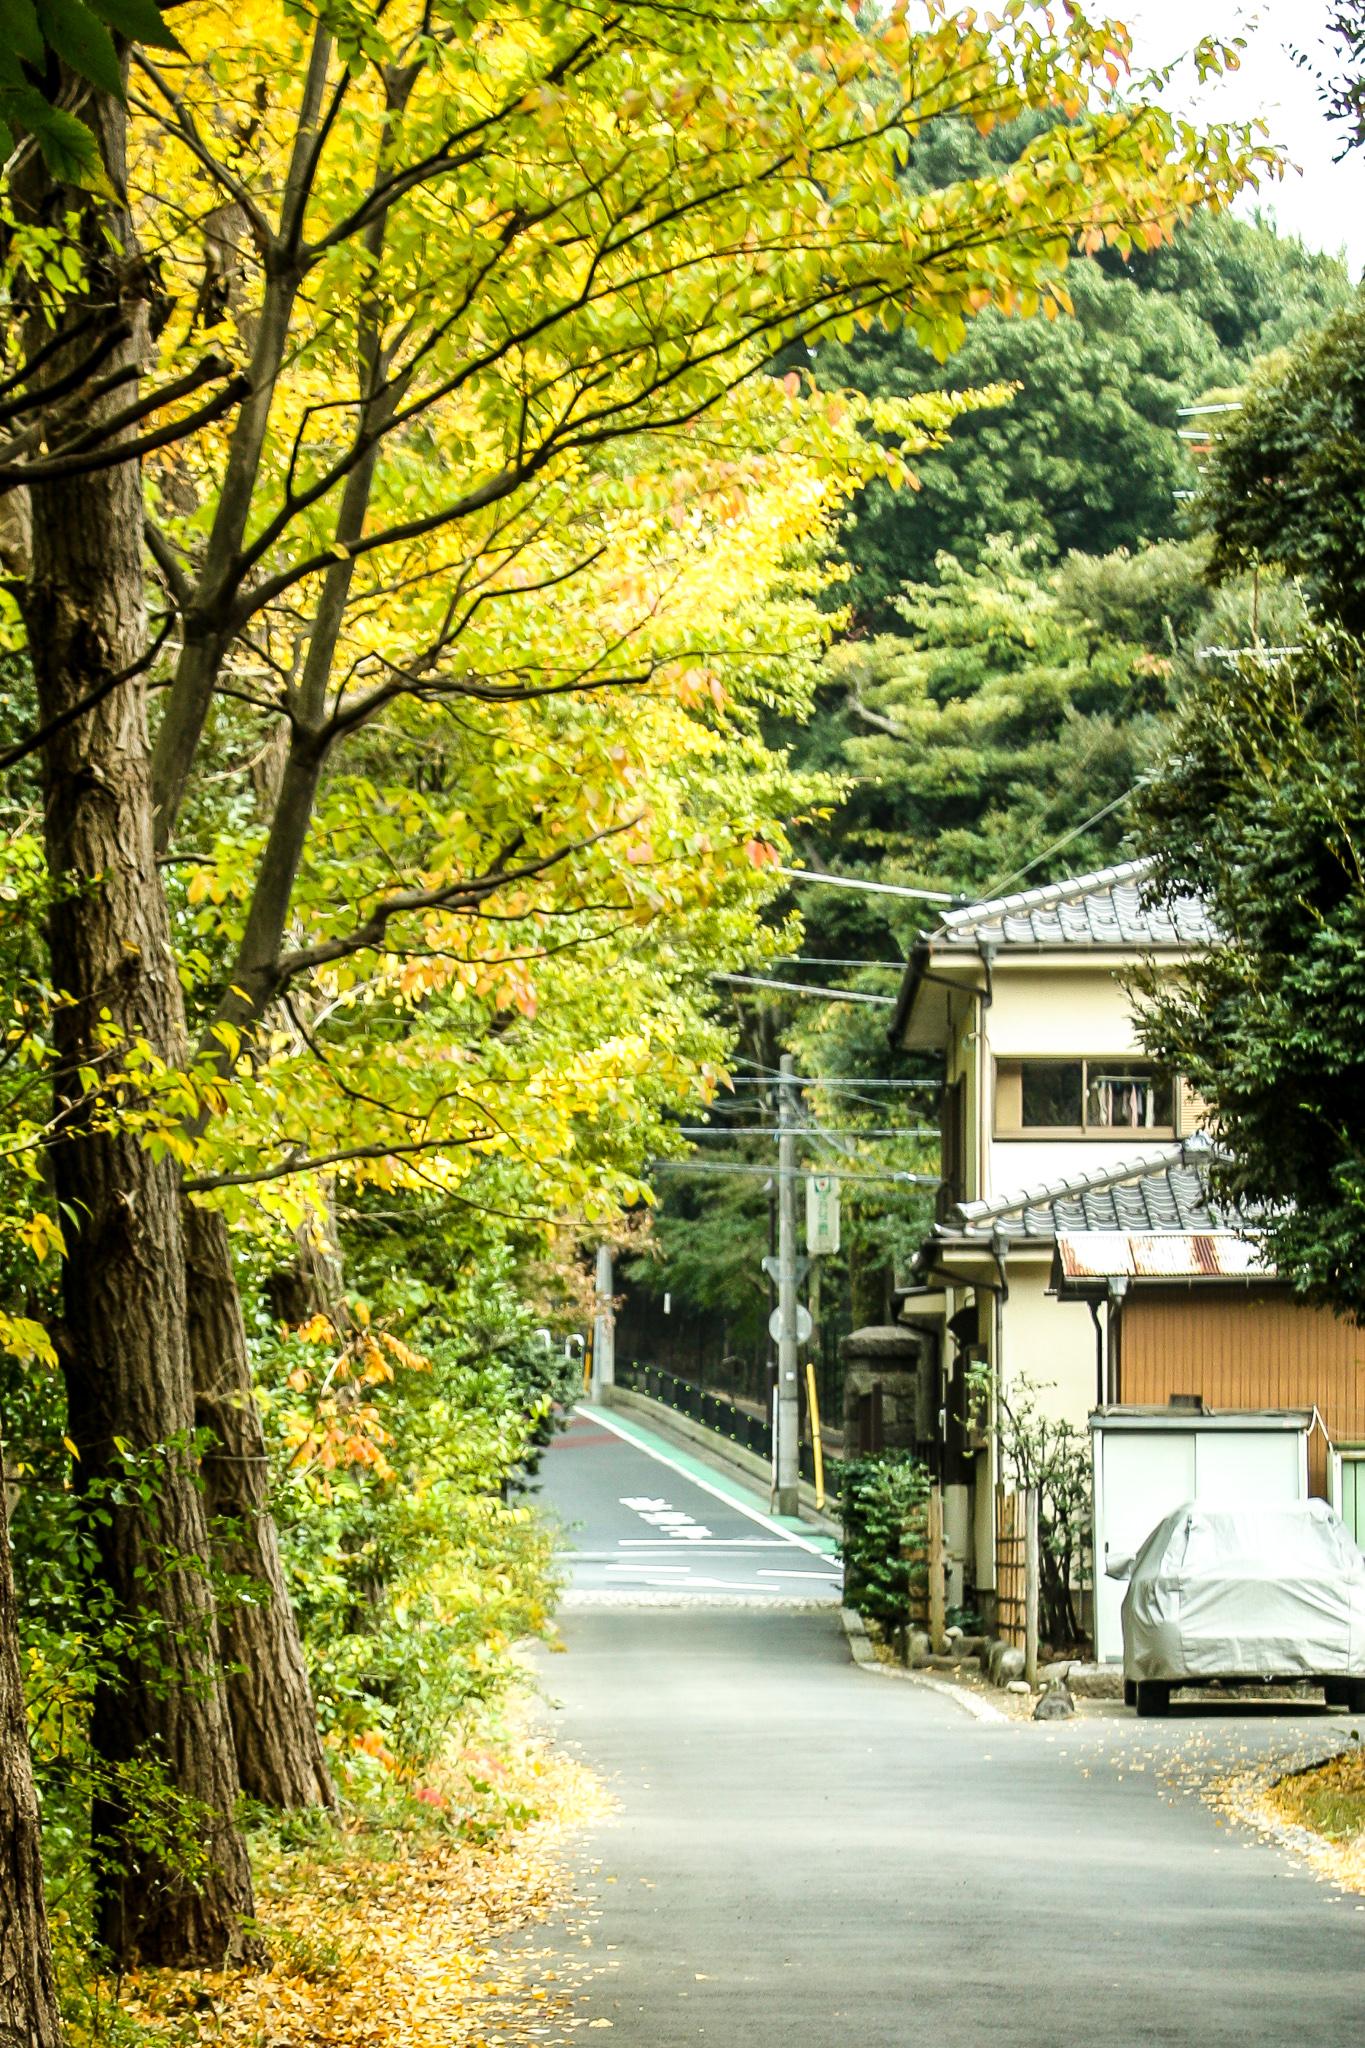 Fall in Japan | Set the Table #gingkotrees #japan #tokyojapan